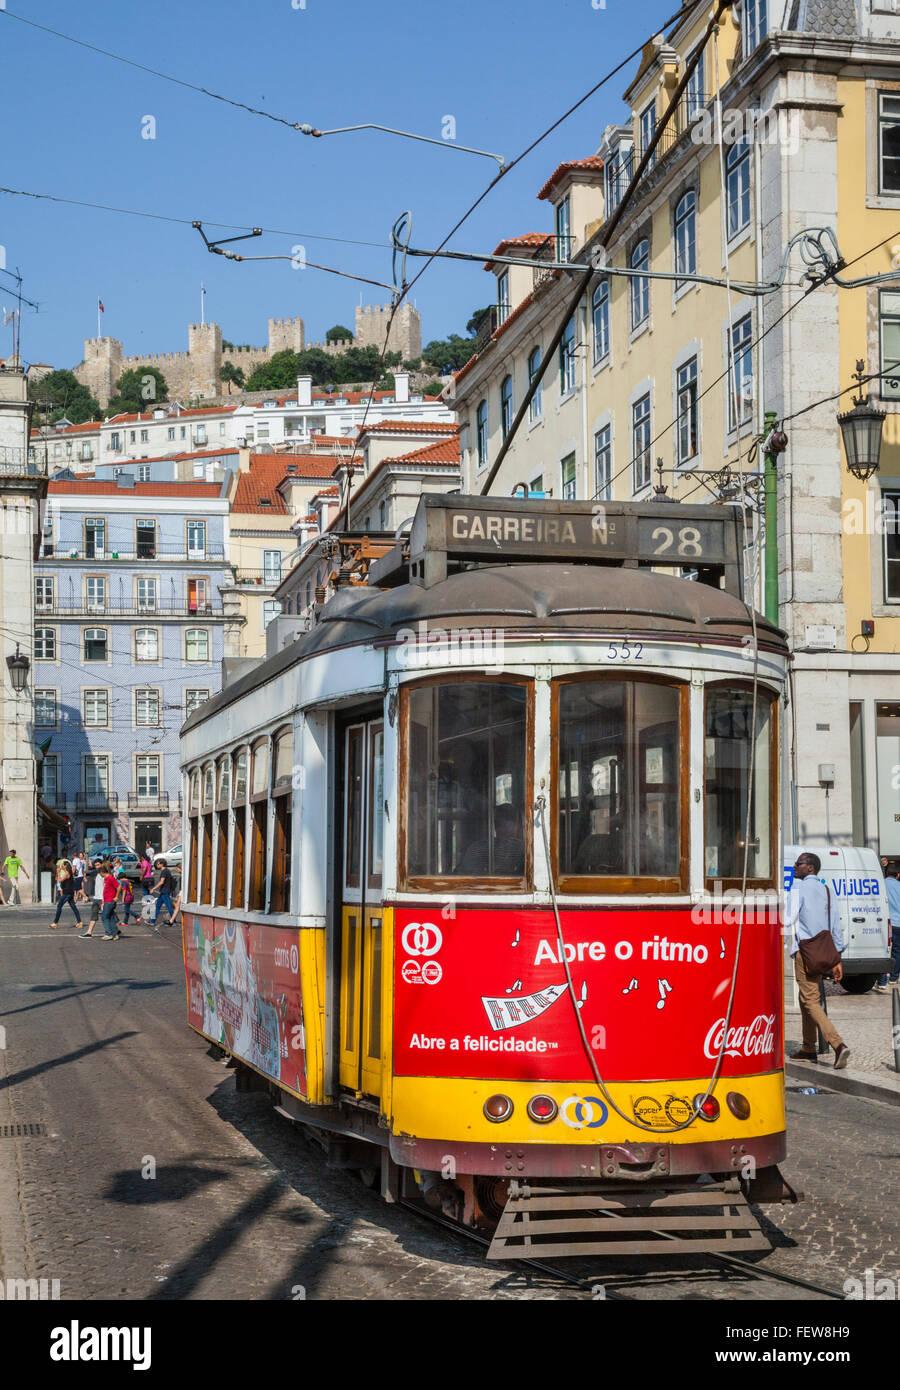 Portugal, Lisbon, Rossio, electric tram at Praca de Figueira - Stock Image